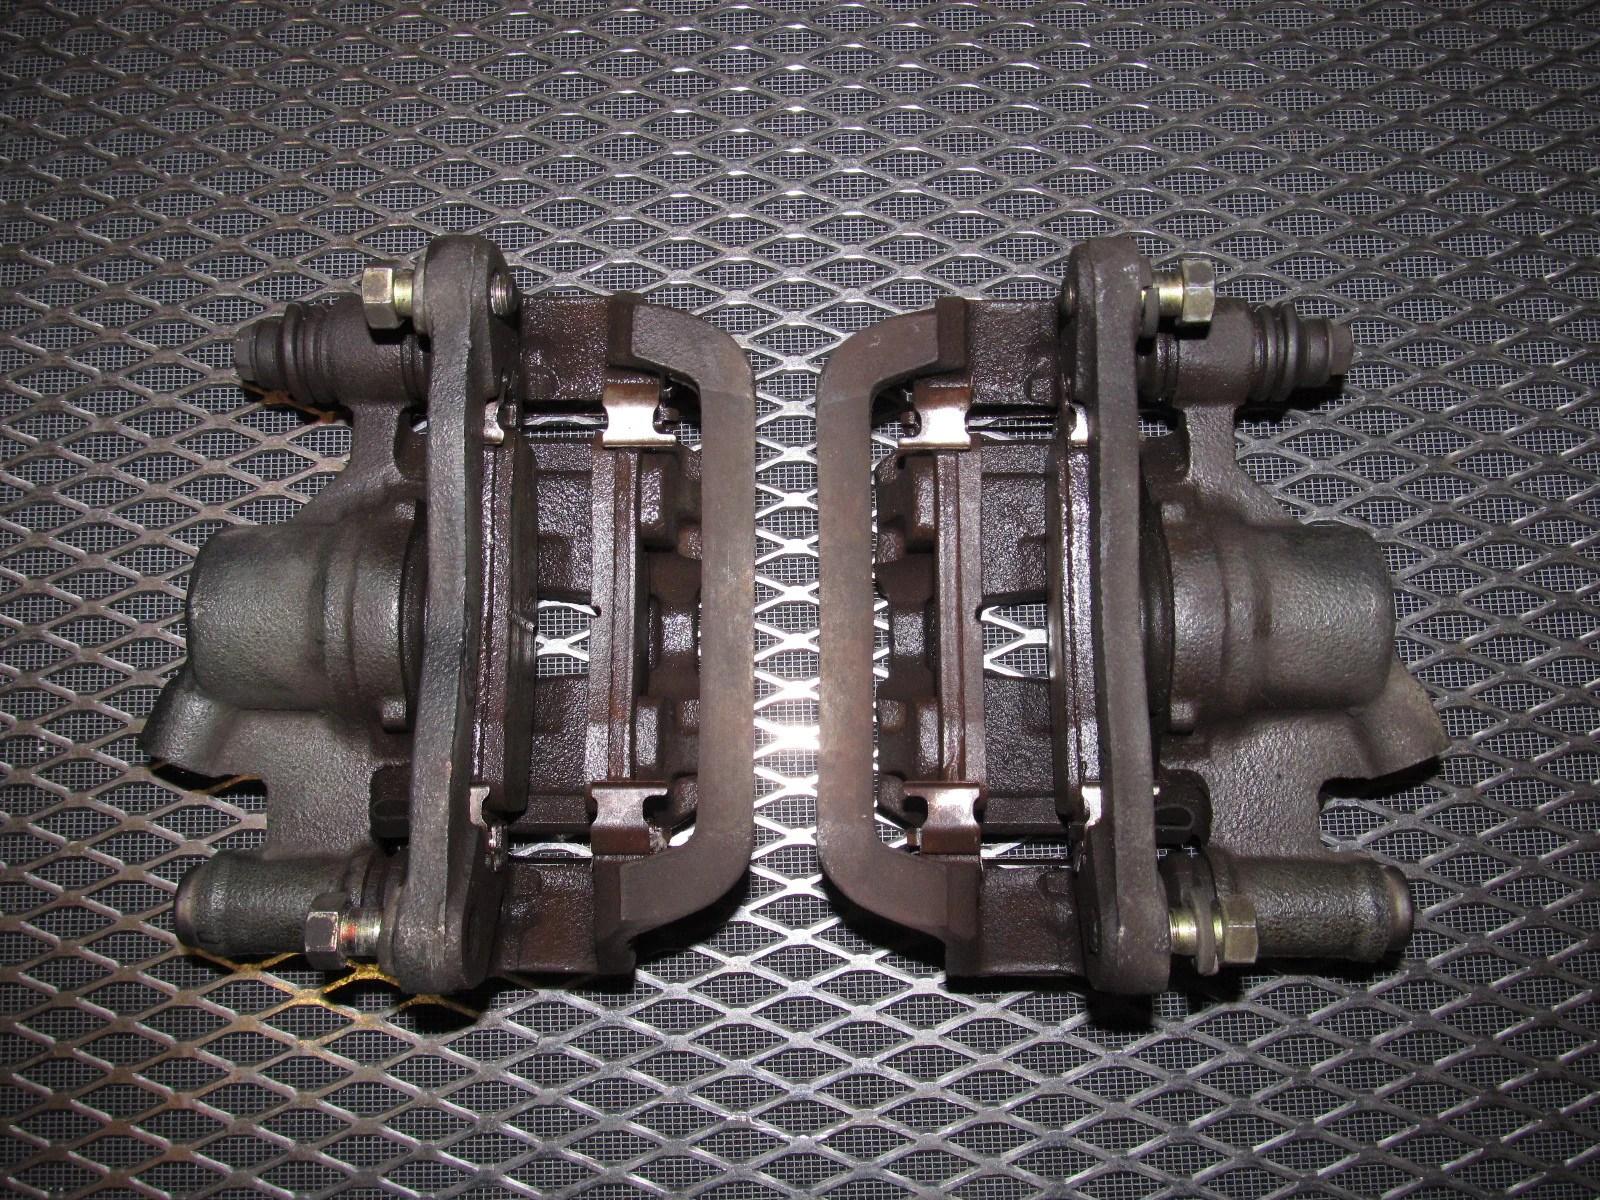 94 95 96 97 mitsubishi 3000gt oem brake caliper rear set [ 1600 x 1200 Pixel ]